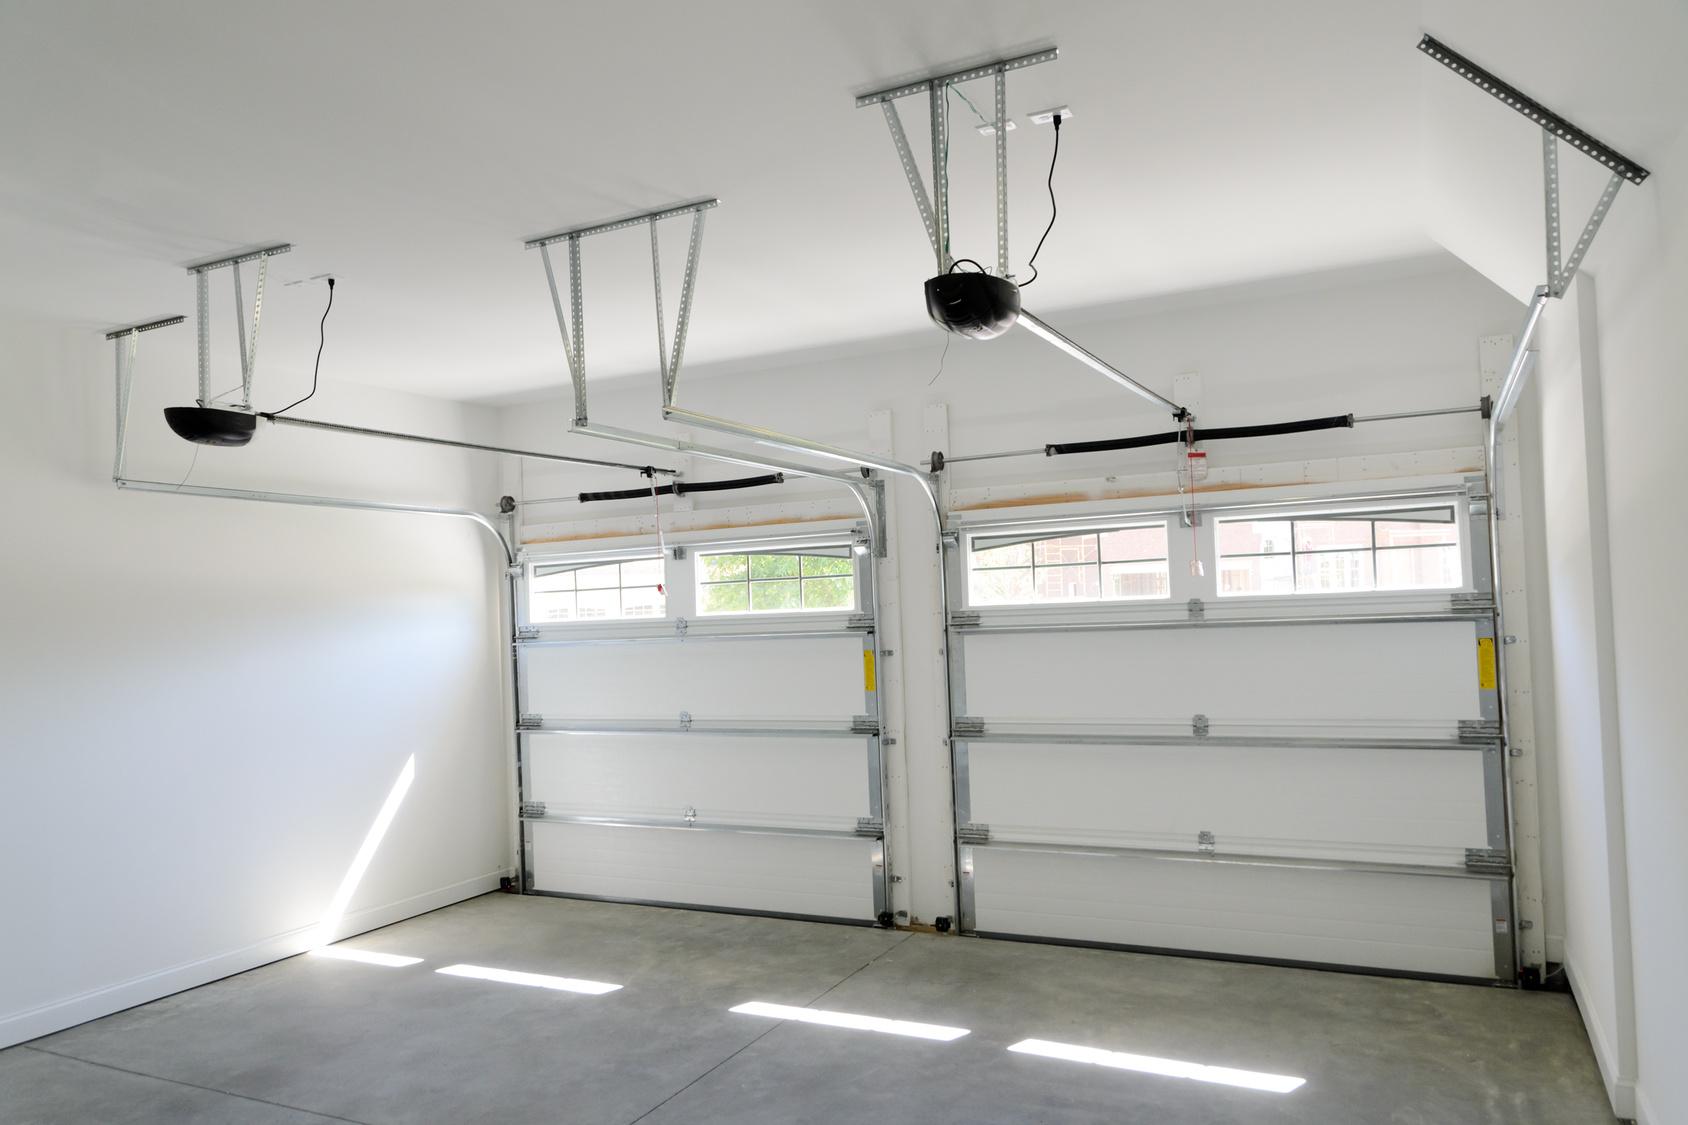 1125 #656249 12 Years Of Garage Door Repair In Utah A Plus Garage Doors wallpaper Utah Garage Doors 36851688